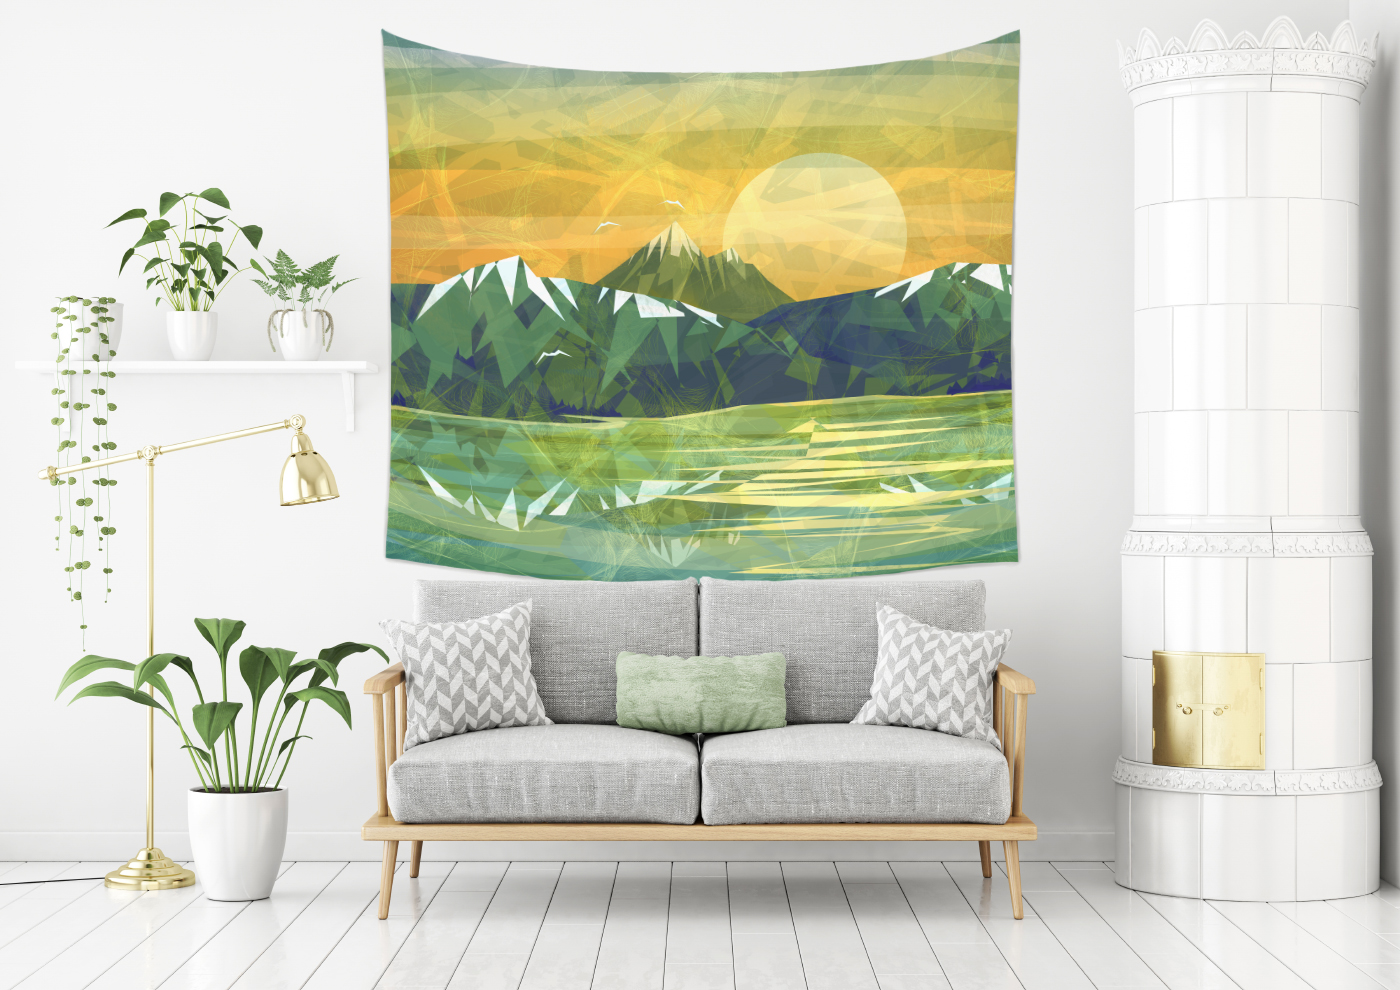 Thubakabra Abstract Mountain Designs For Home Decors